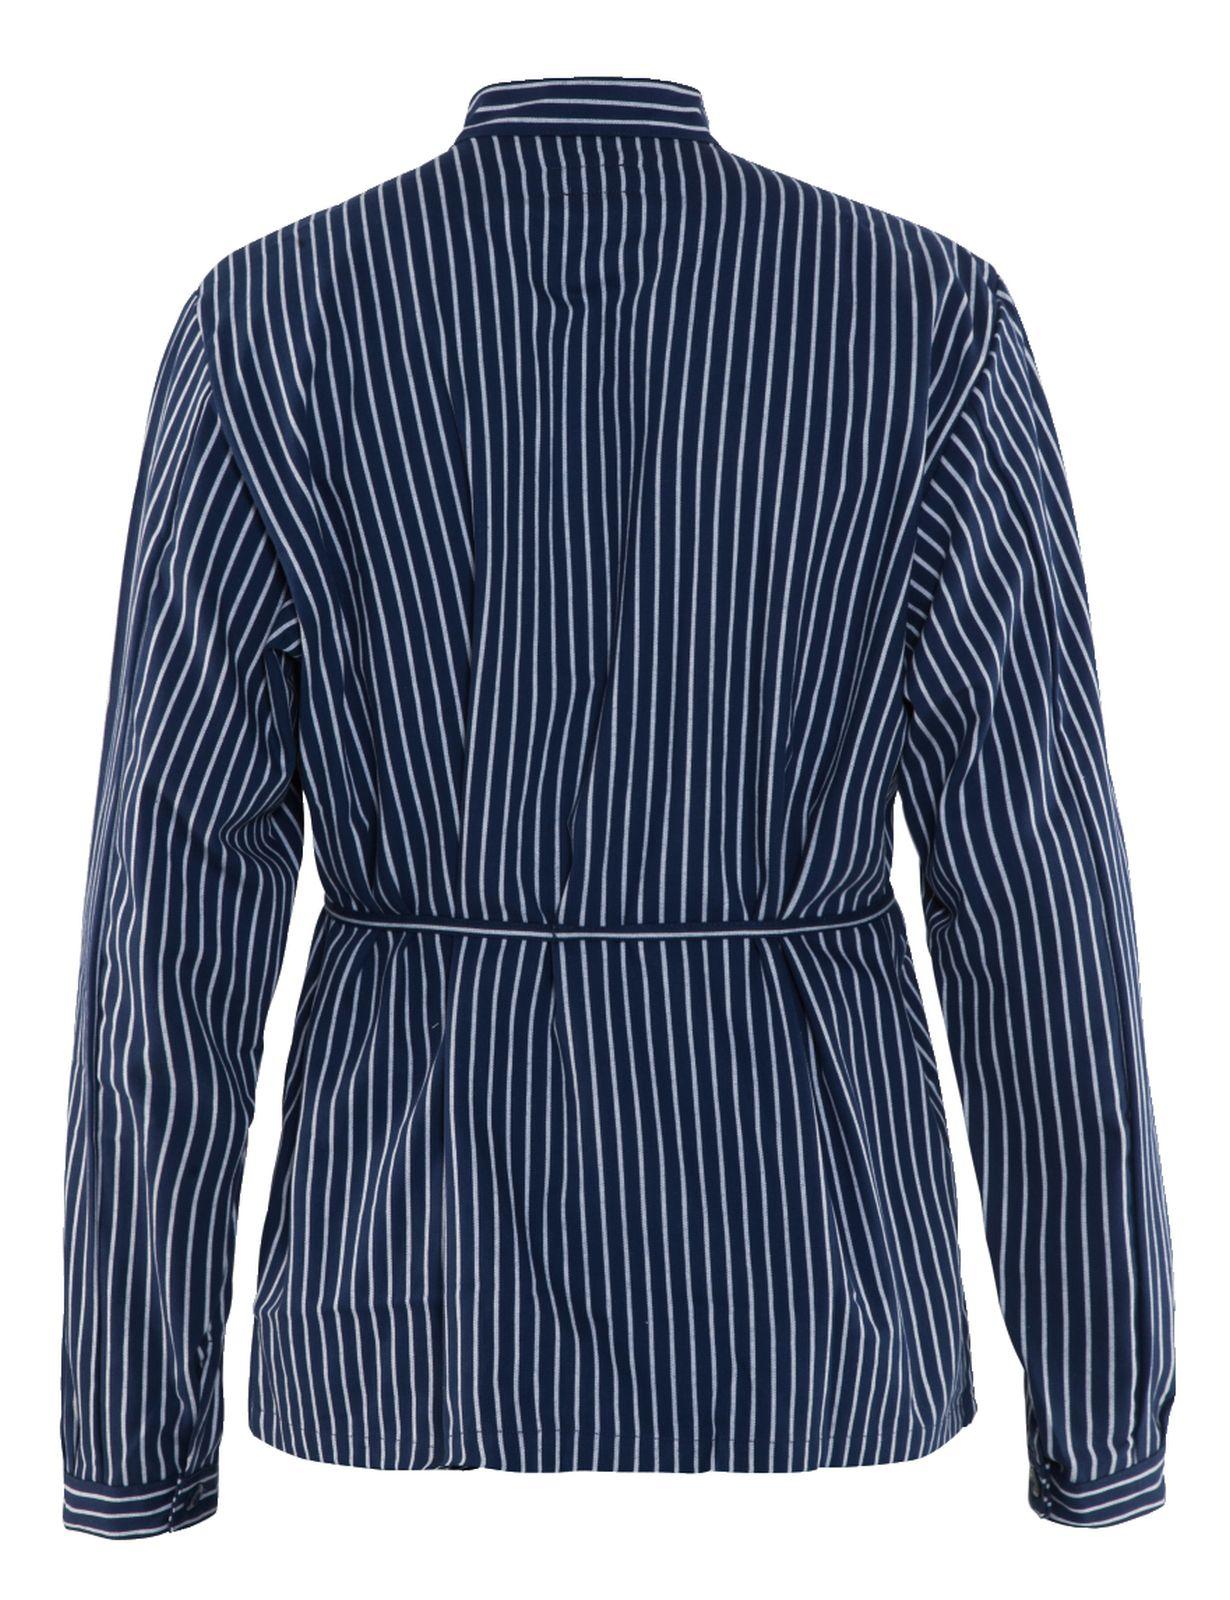 Blaklader Shirts 32501125 marineblauw-wit(8810)